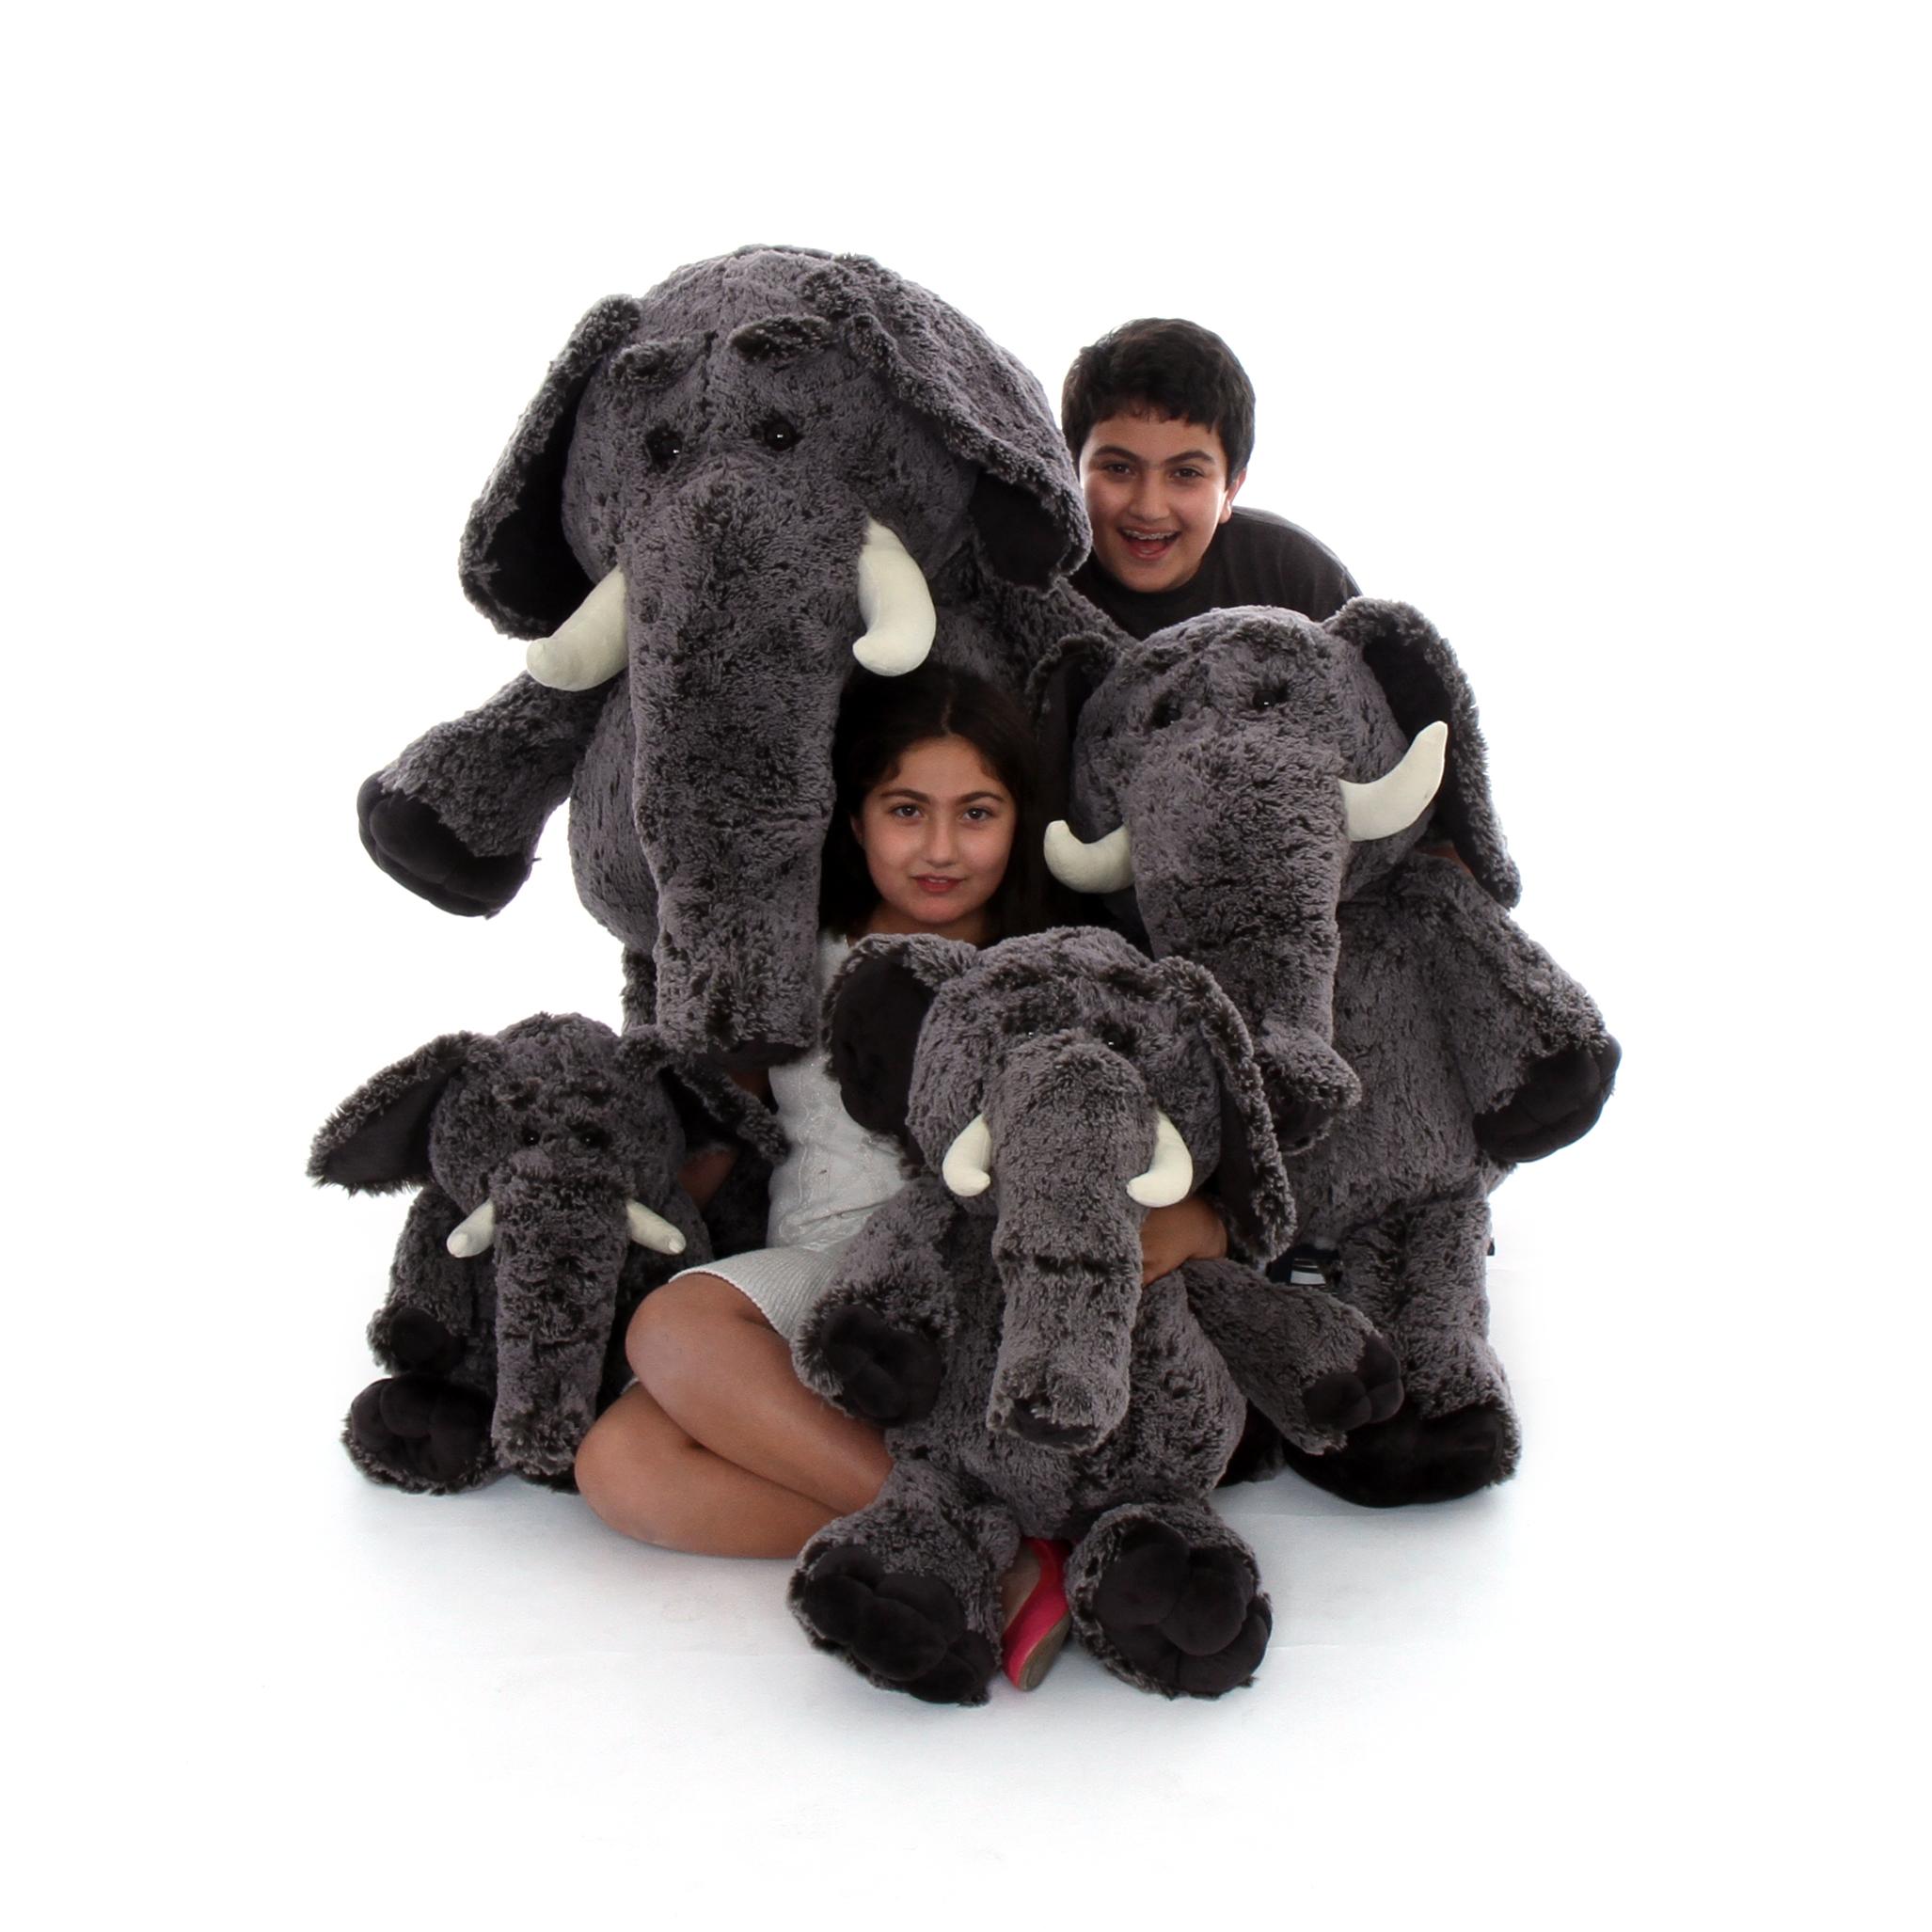 elephant giant teddy